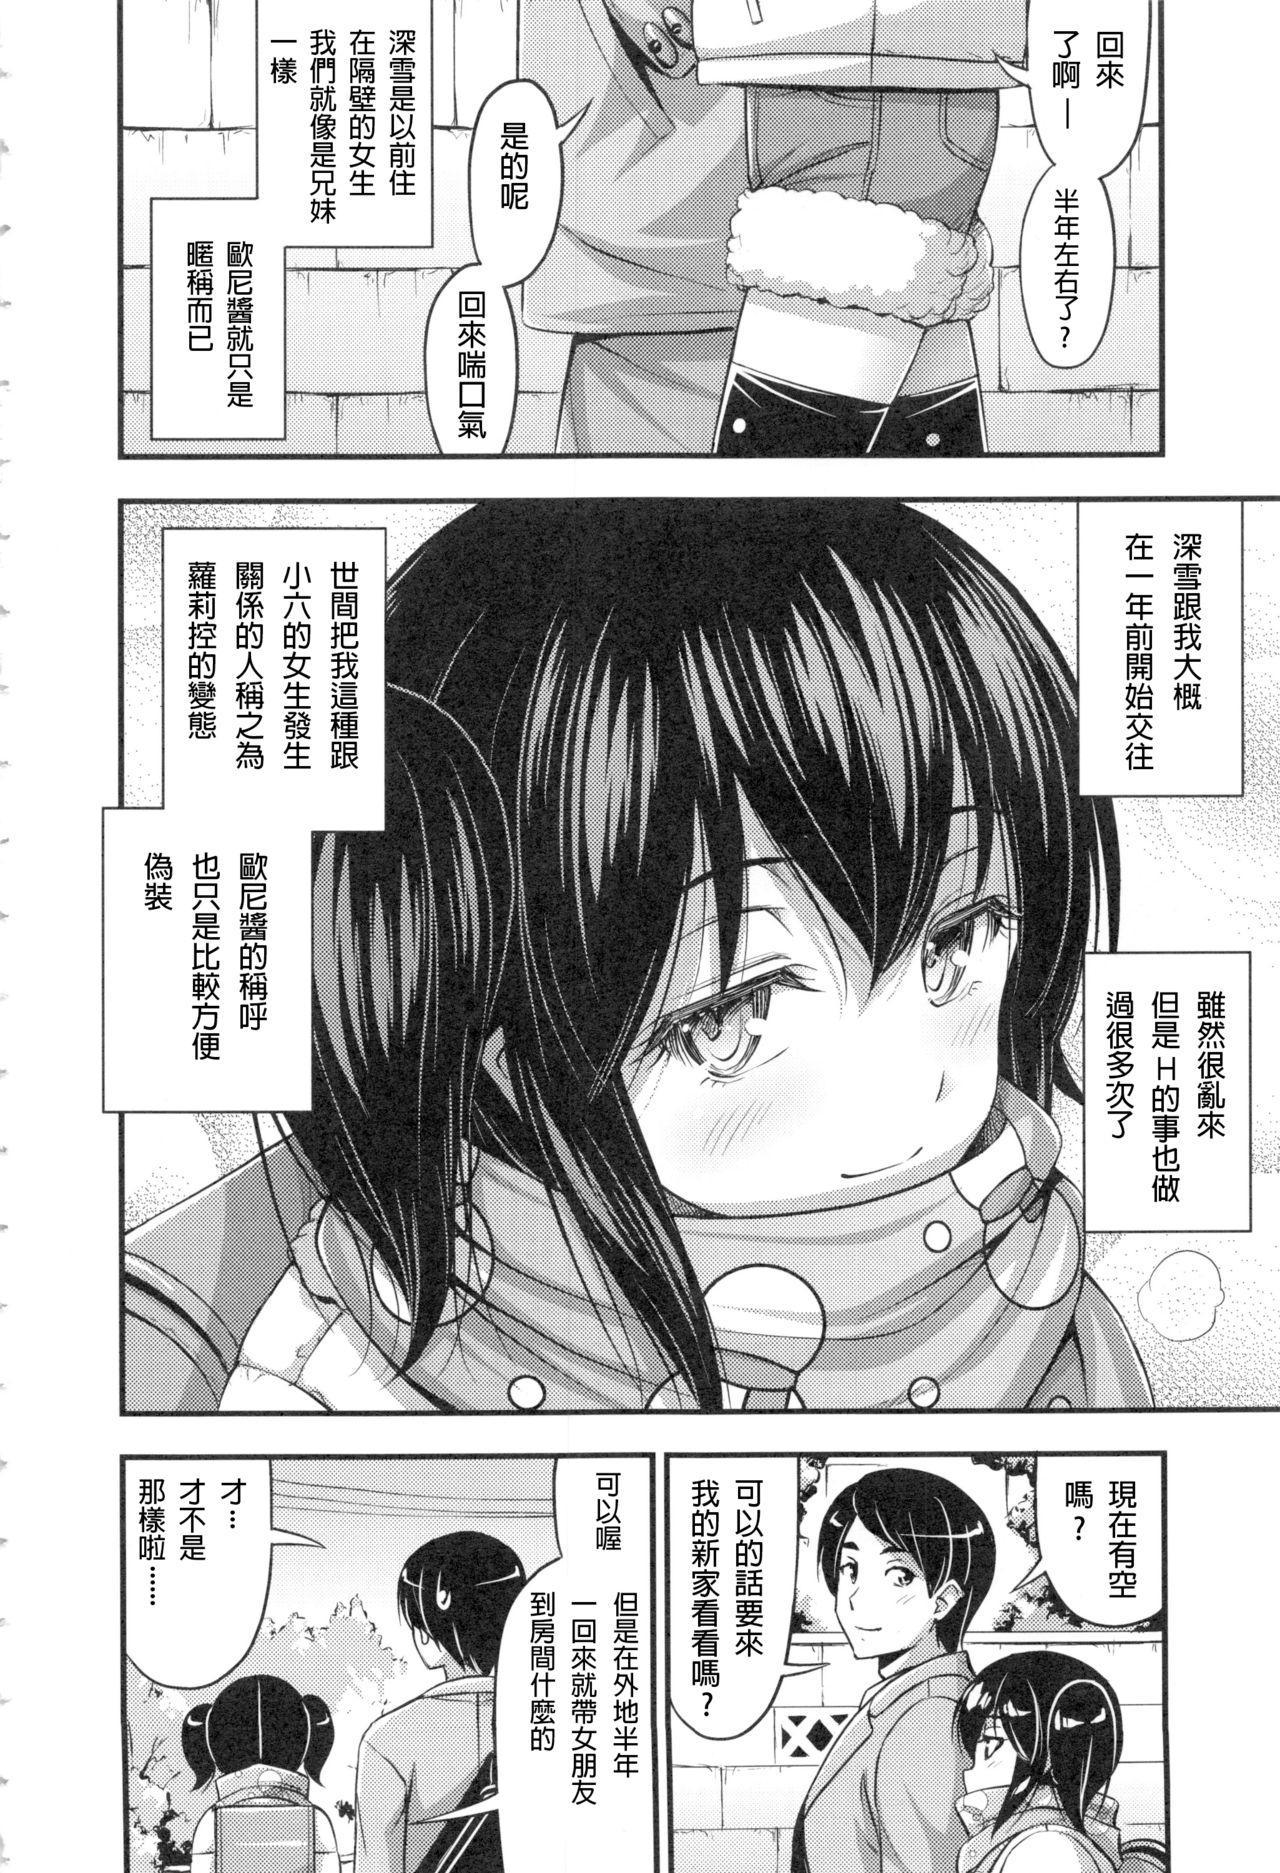 Onii-chan Sonna ni Short Pants Suki nano? 27